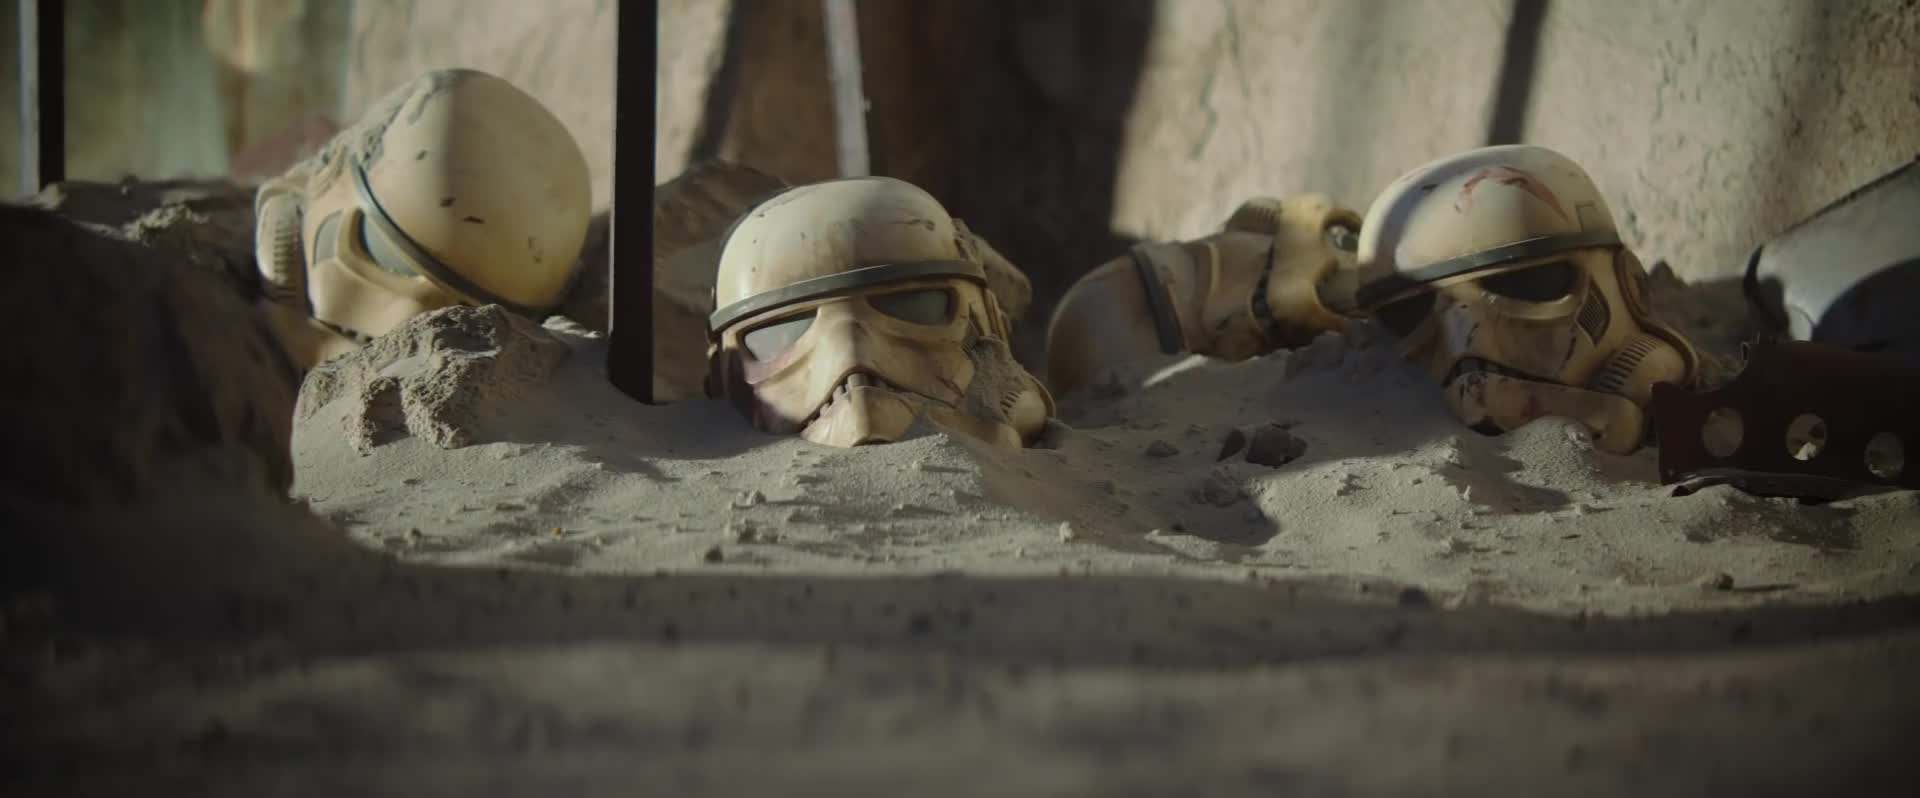 Trailer, Serie, Star Wars, Disney, Disney+, The Mandalorian, Lucasfilm, Disney Plus